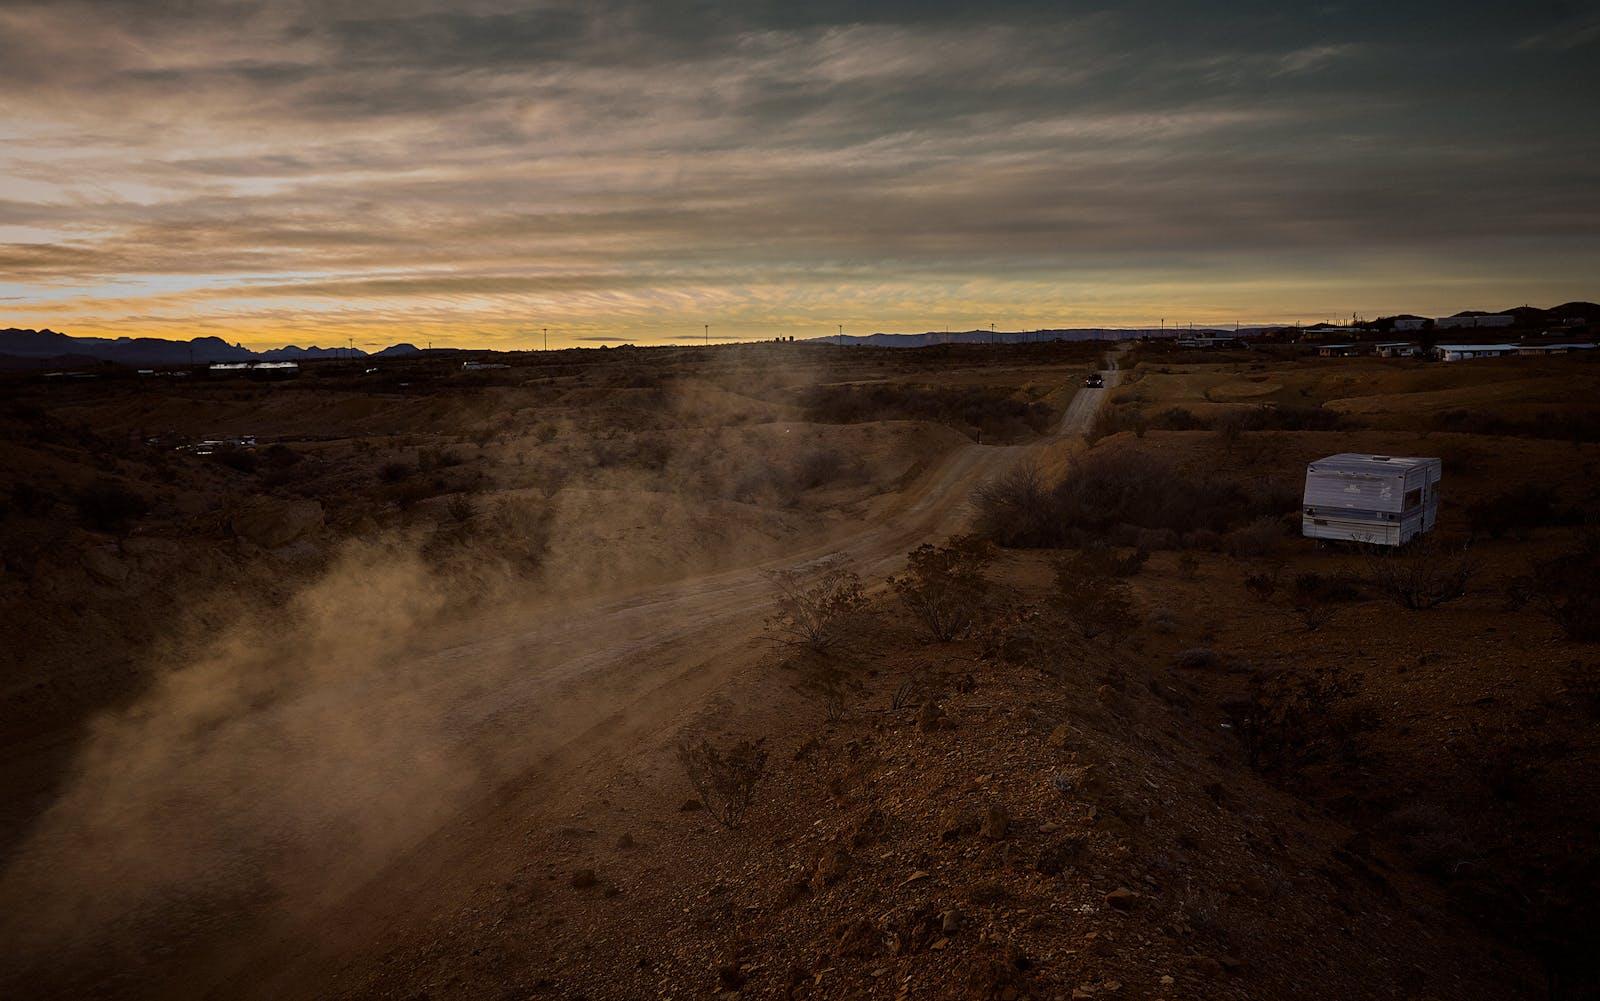 A dirt road near Terlingua, Texas.